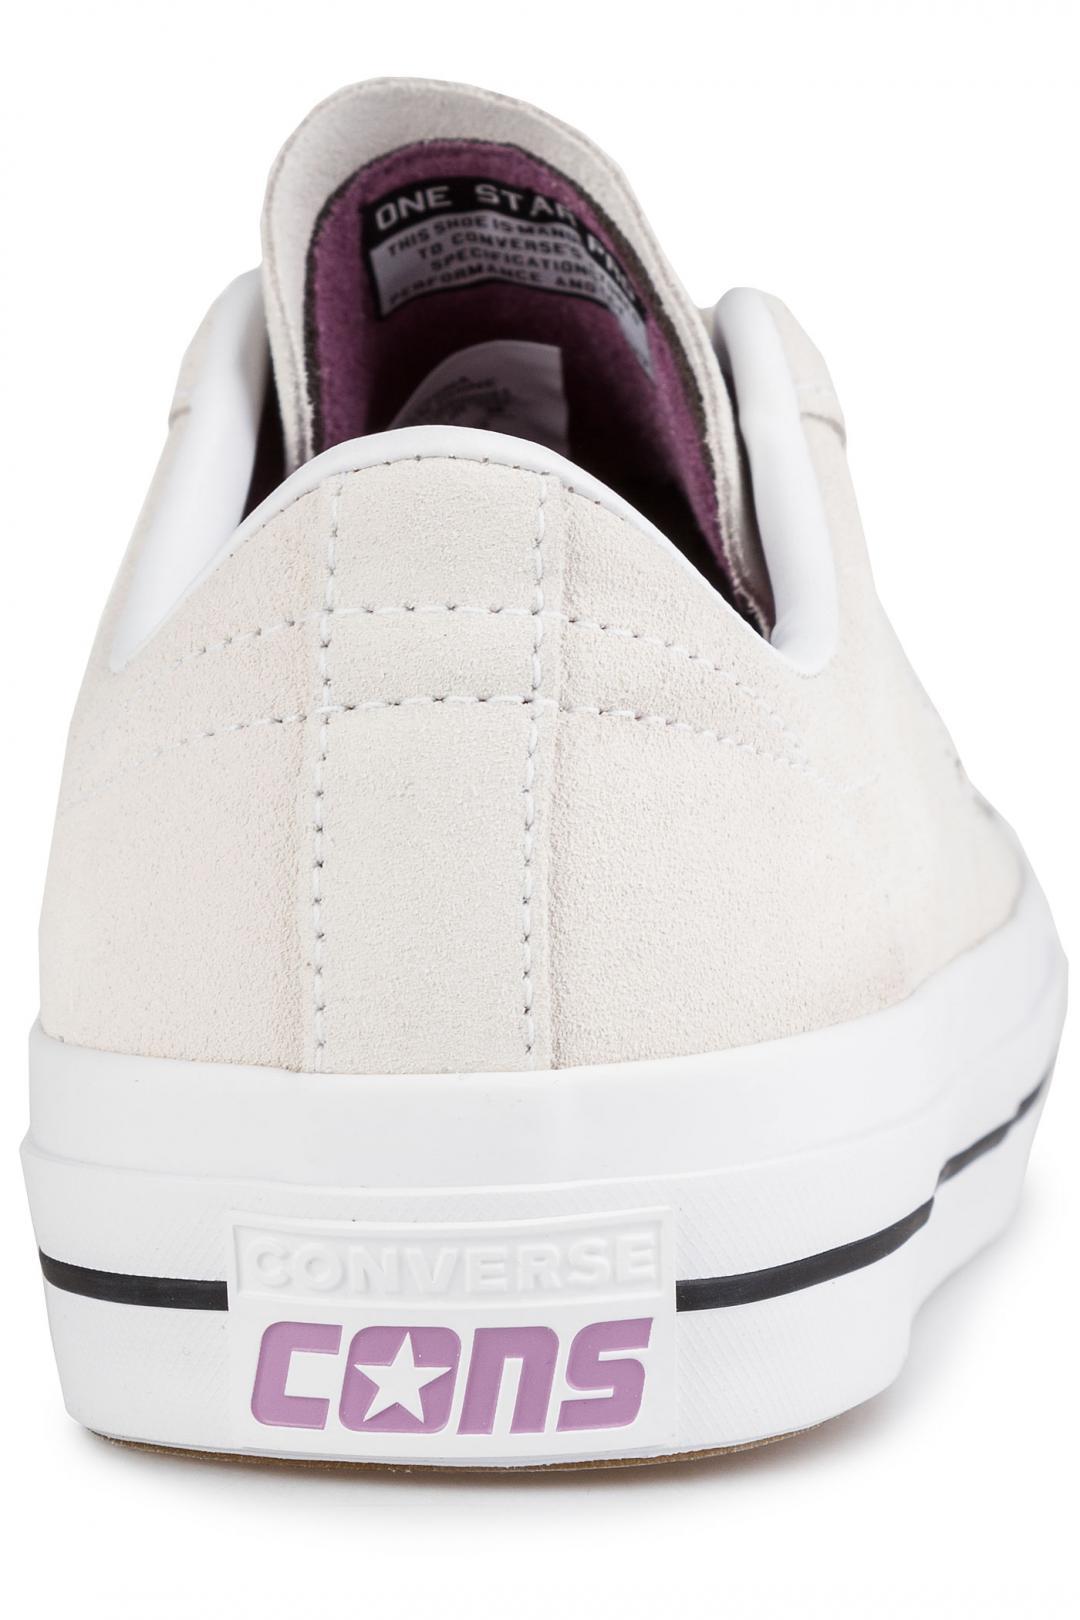 Uomo Converse One Star Pro egret violet dust white   Scarpe da skate